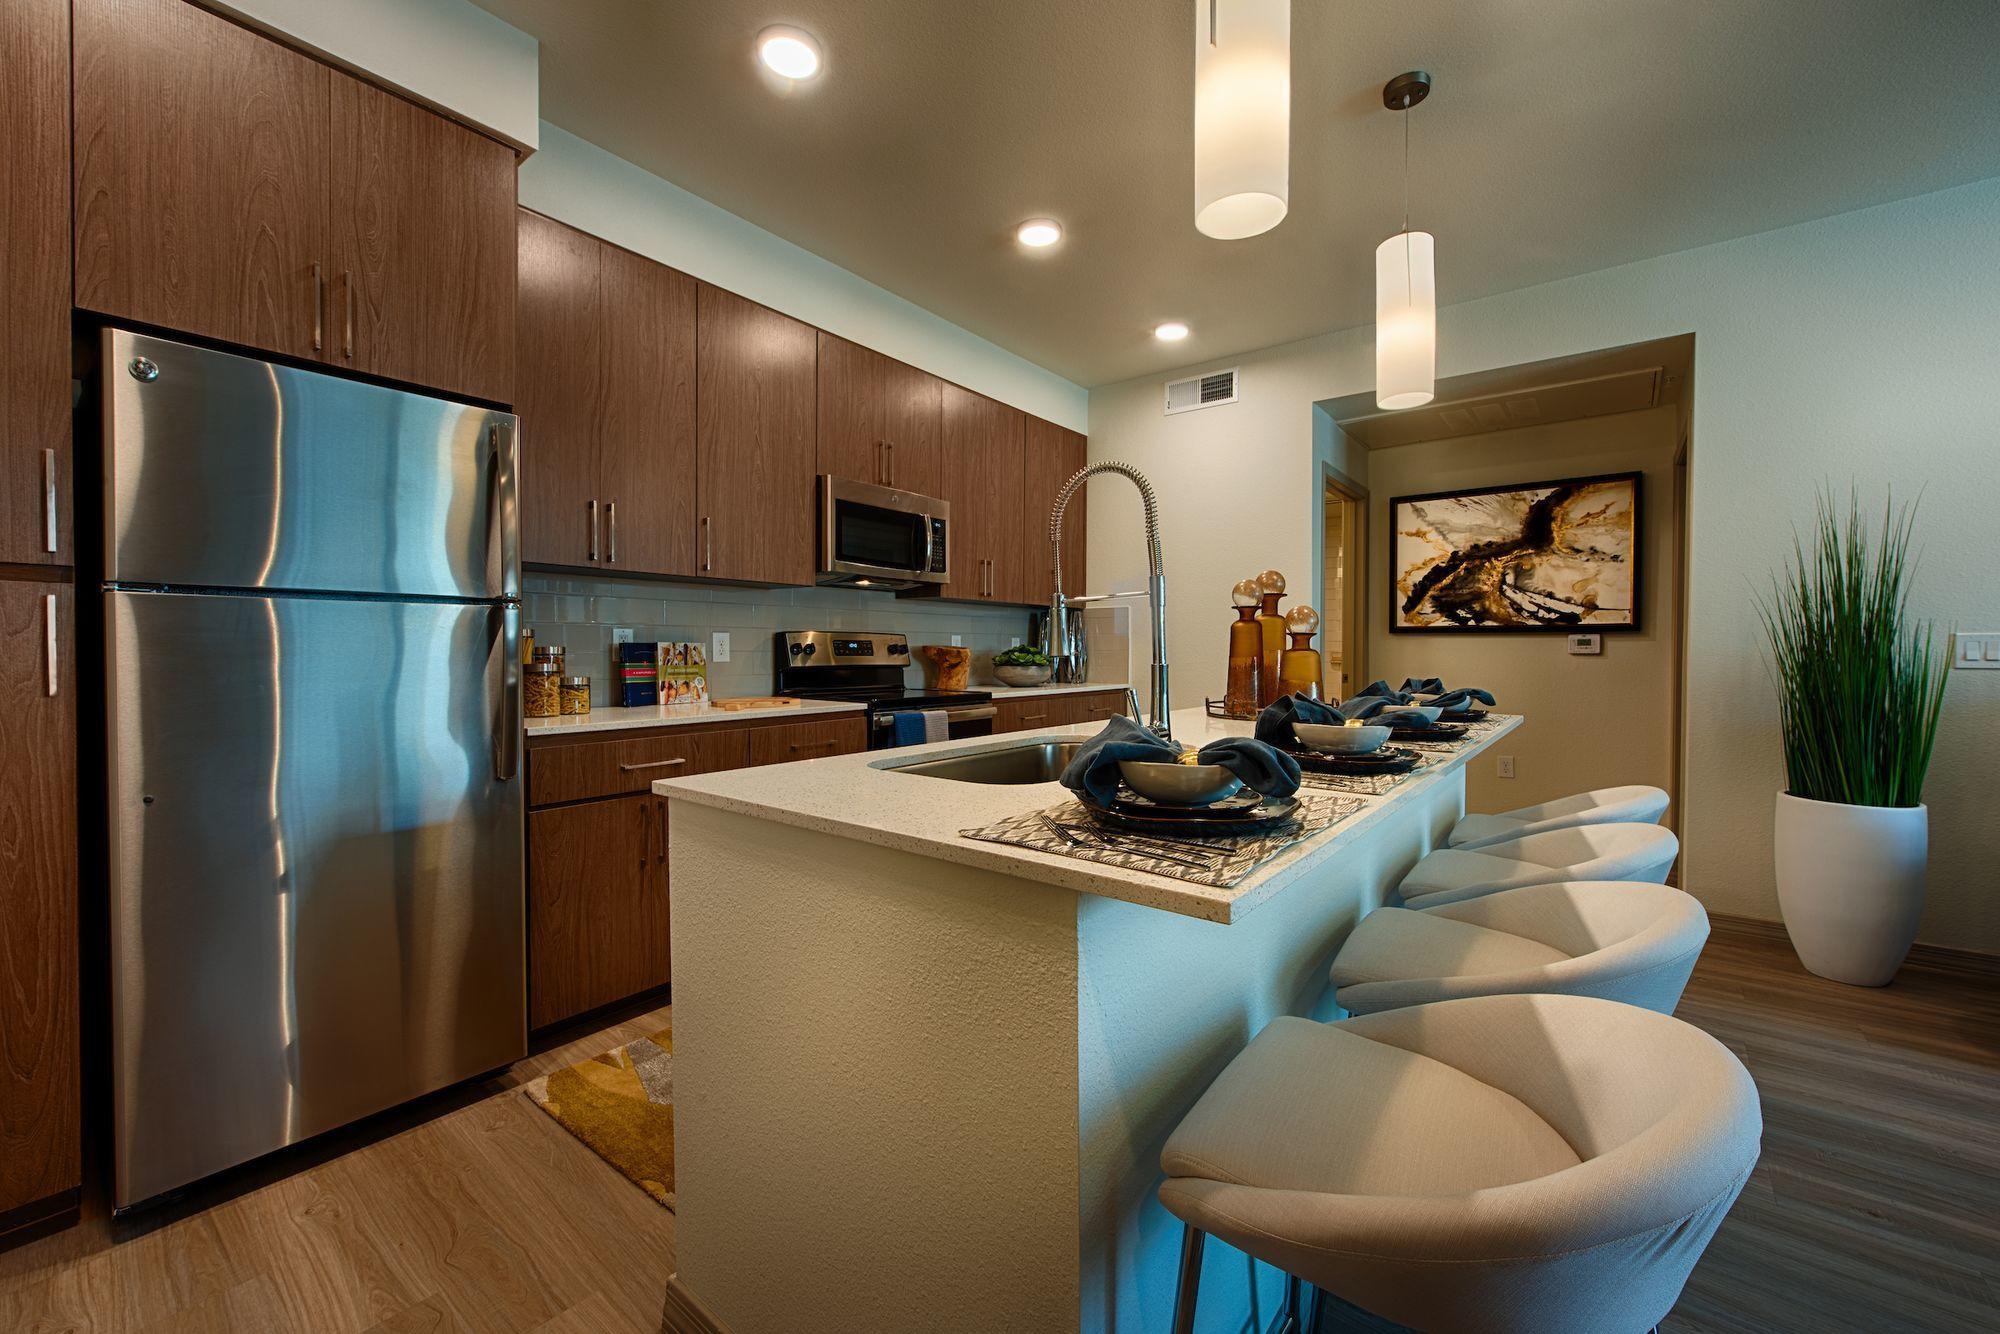 Apartments Near Thunderbird Elevation Plaza Del Rio for Thunderbird School of Global Management Students in Glendale, AZ